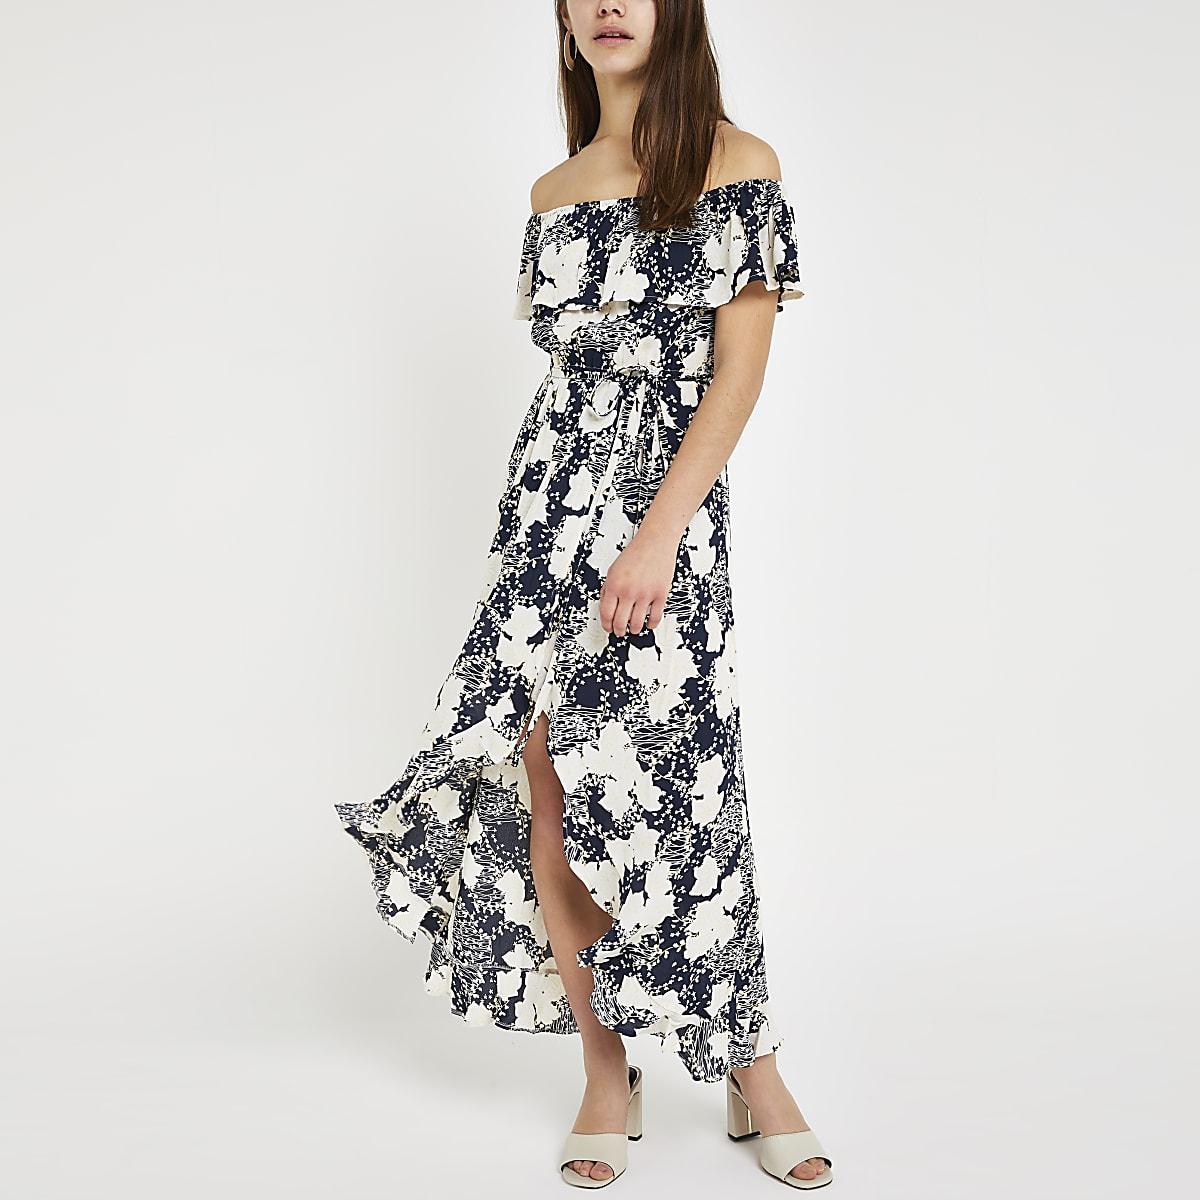 c4b2377767 Petite blue floral bardot maxi dress - Maxi Dresses - Dresses - women